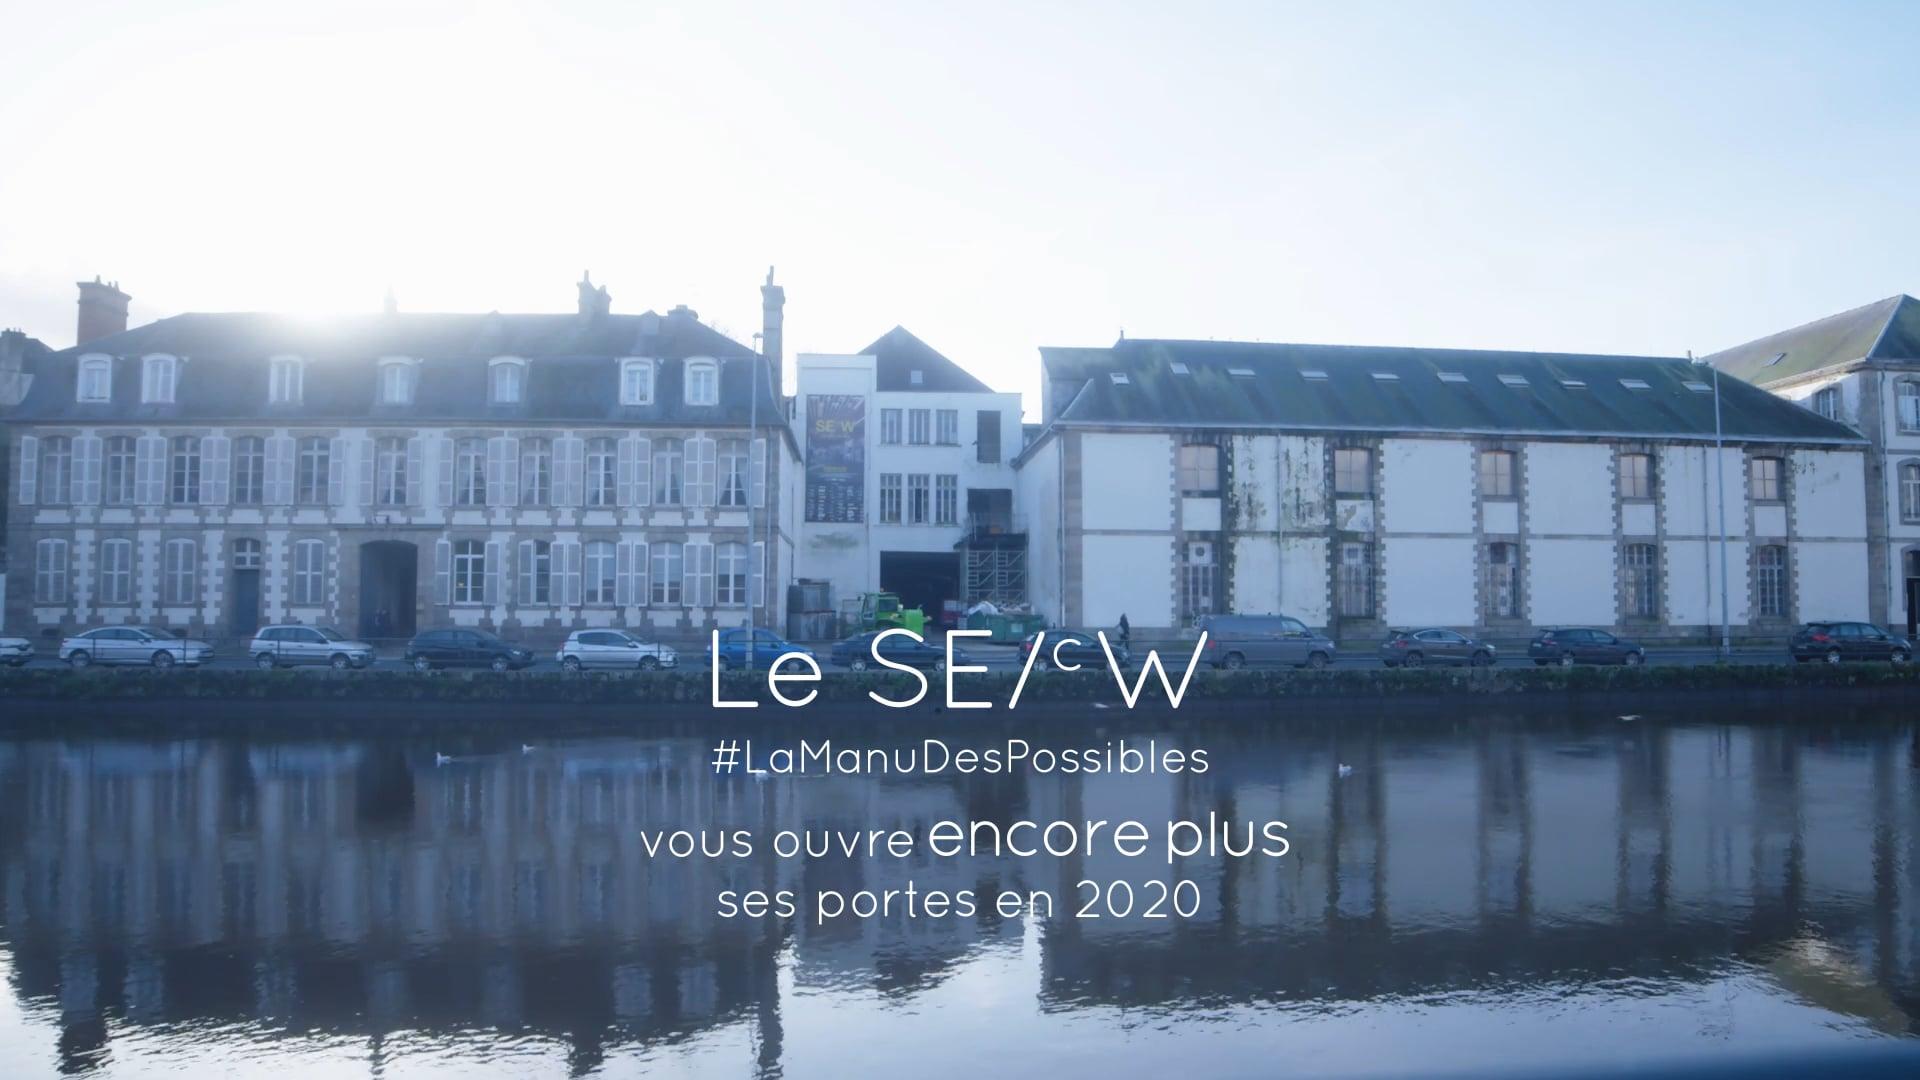 SE/cW Vidéo de vœux 2020